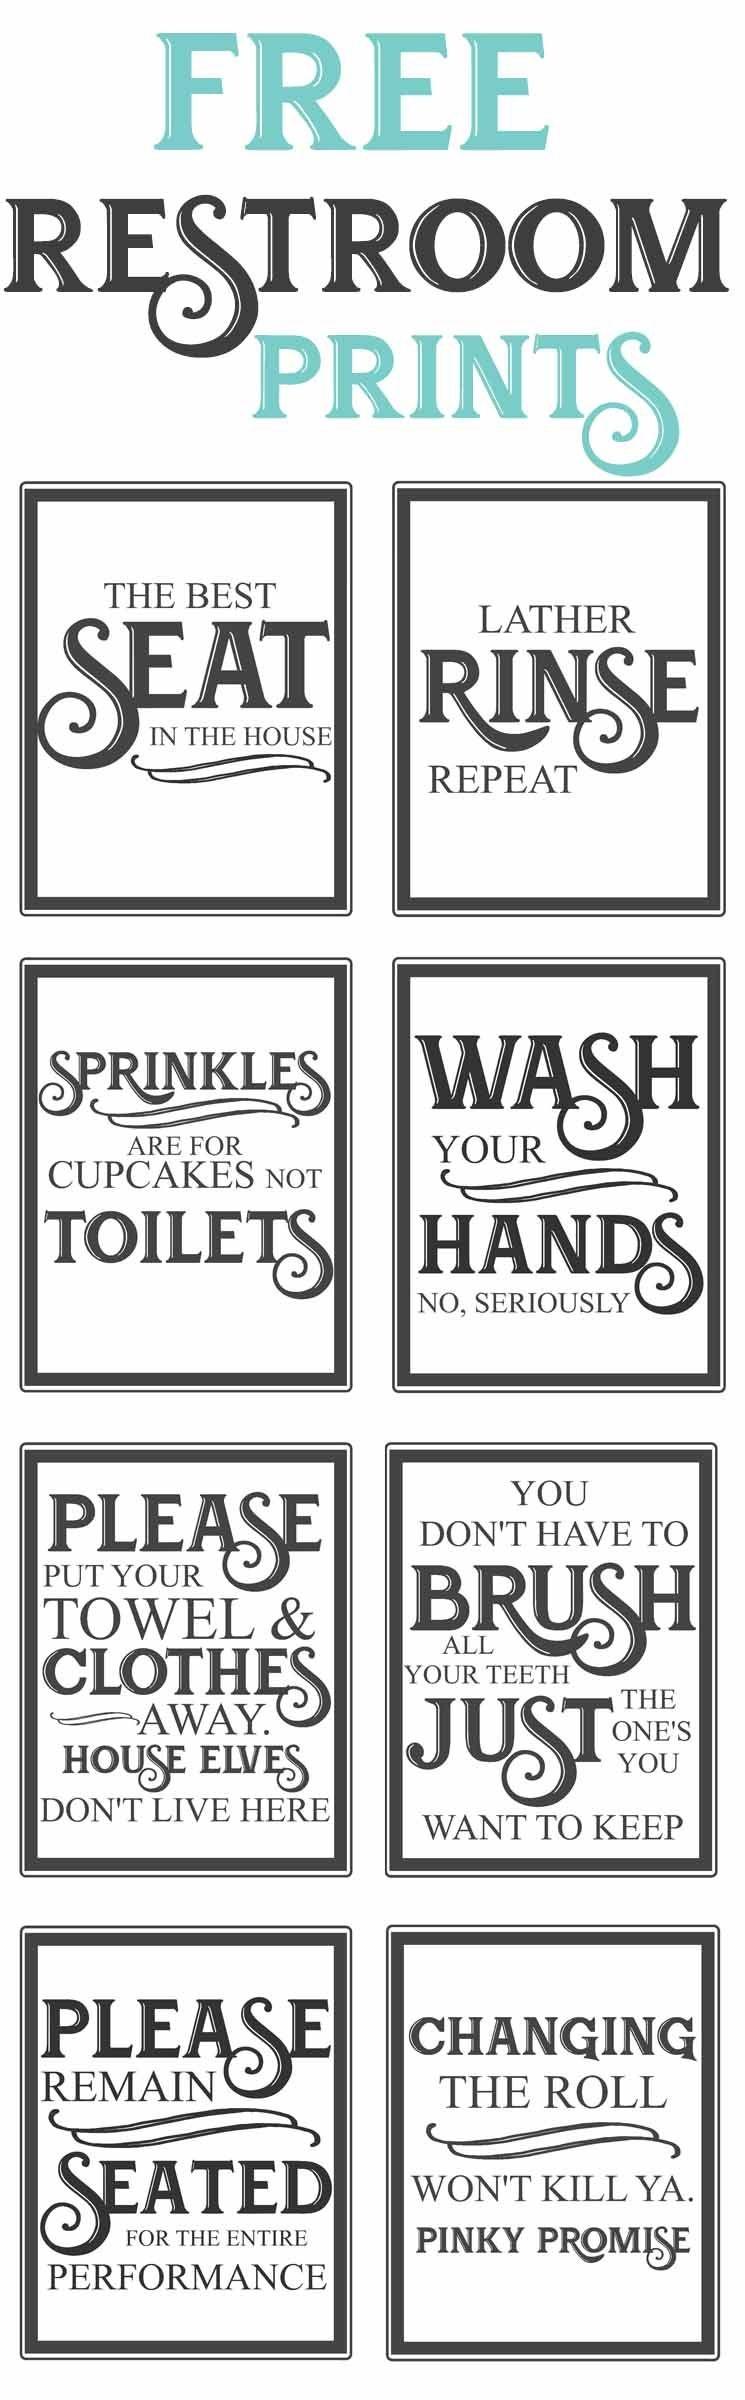 Free Vintage Bathroom Printables   Diy   Vintage Bathrooms, Diy Home - Free Printable Funny Posters